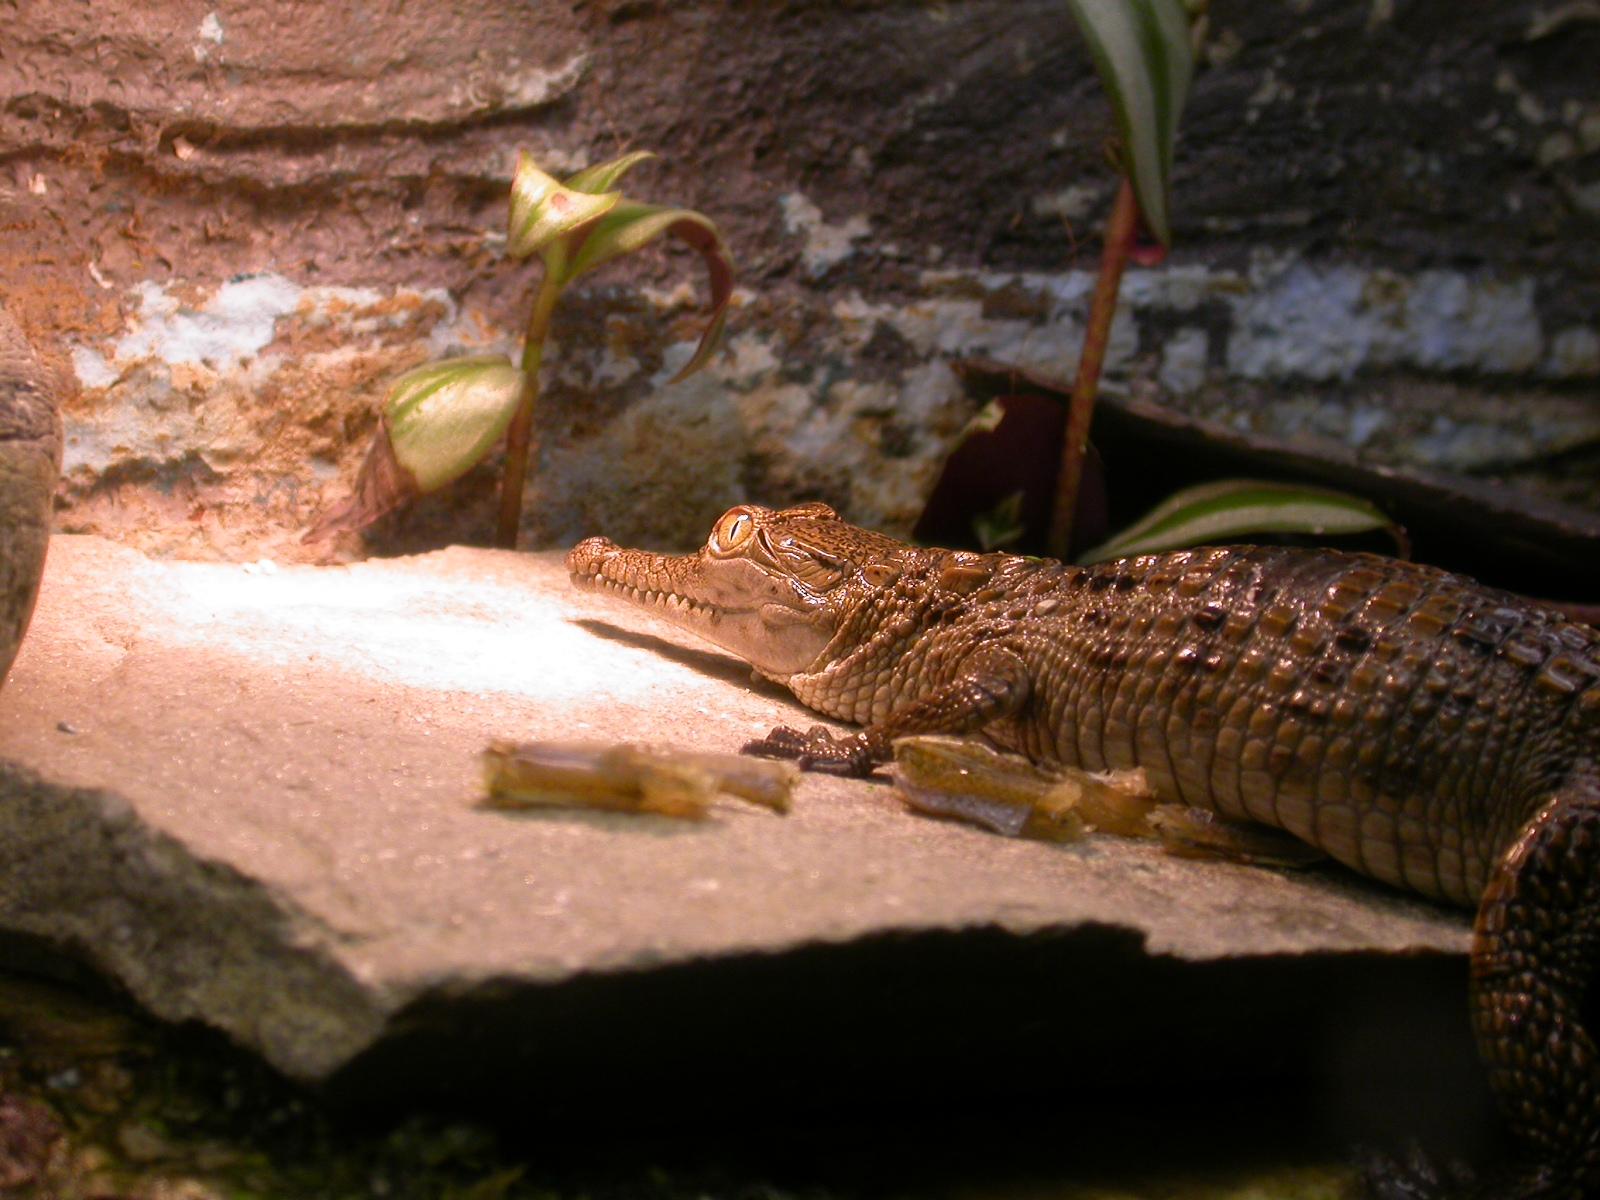 eva nature animals land reptile crocodile alligator young baby